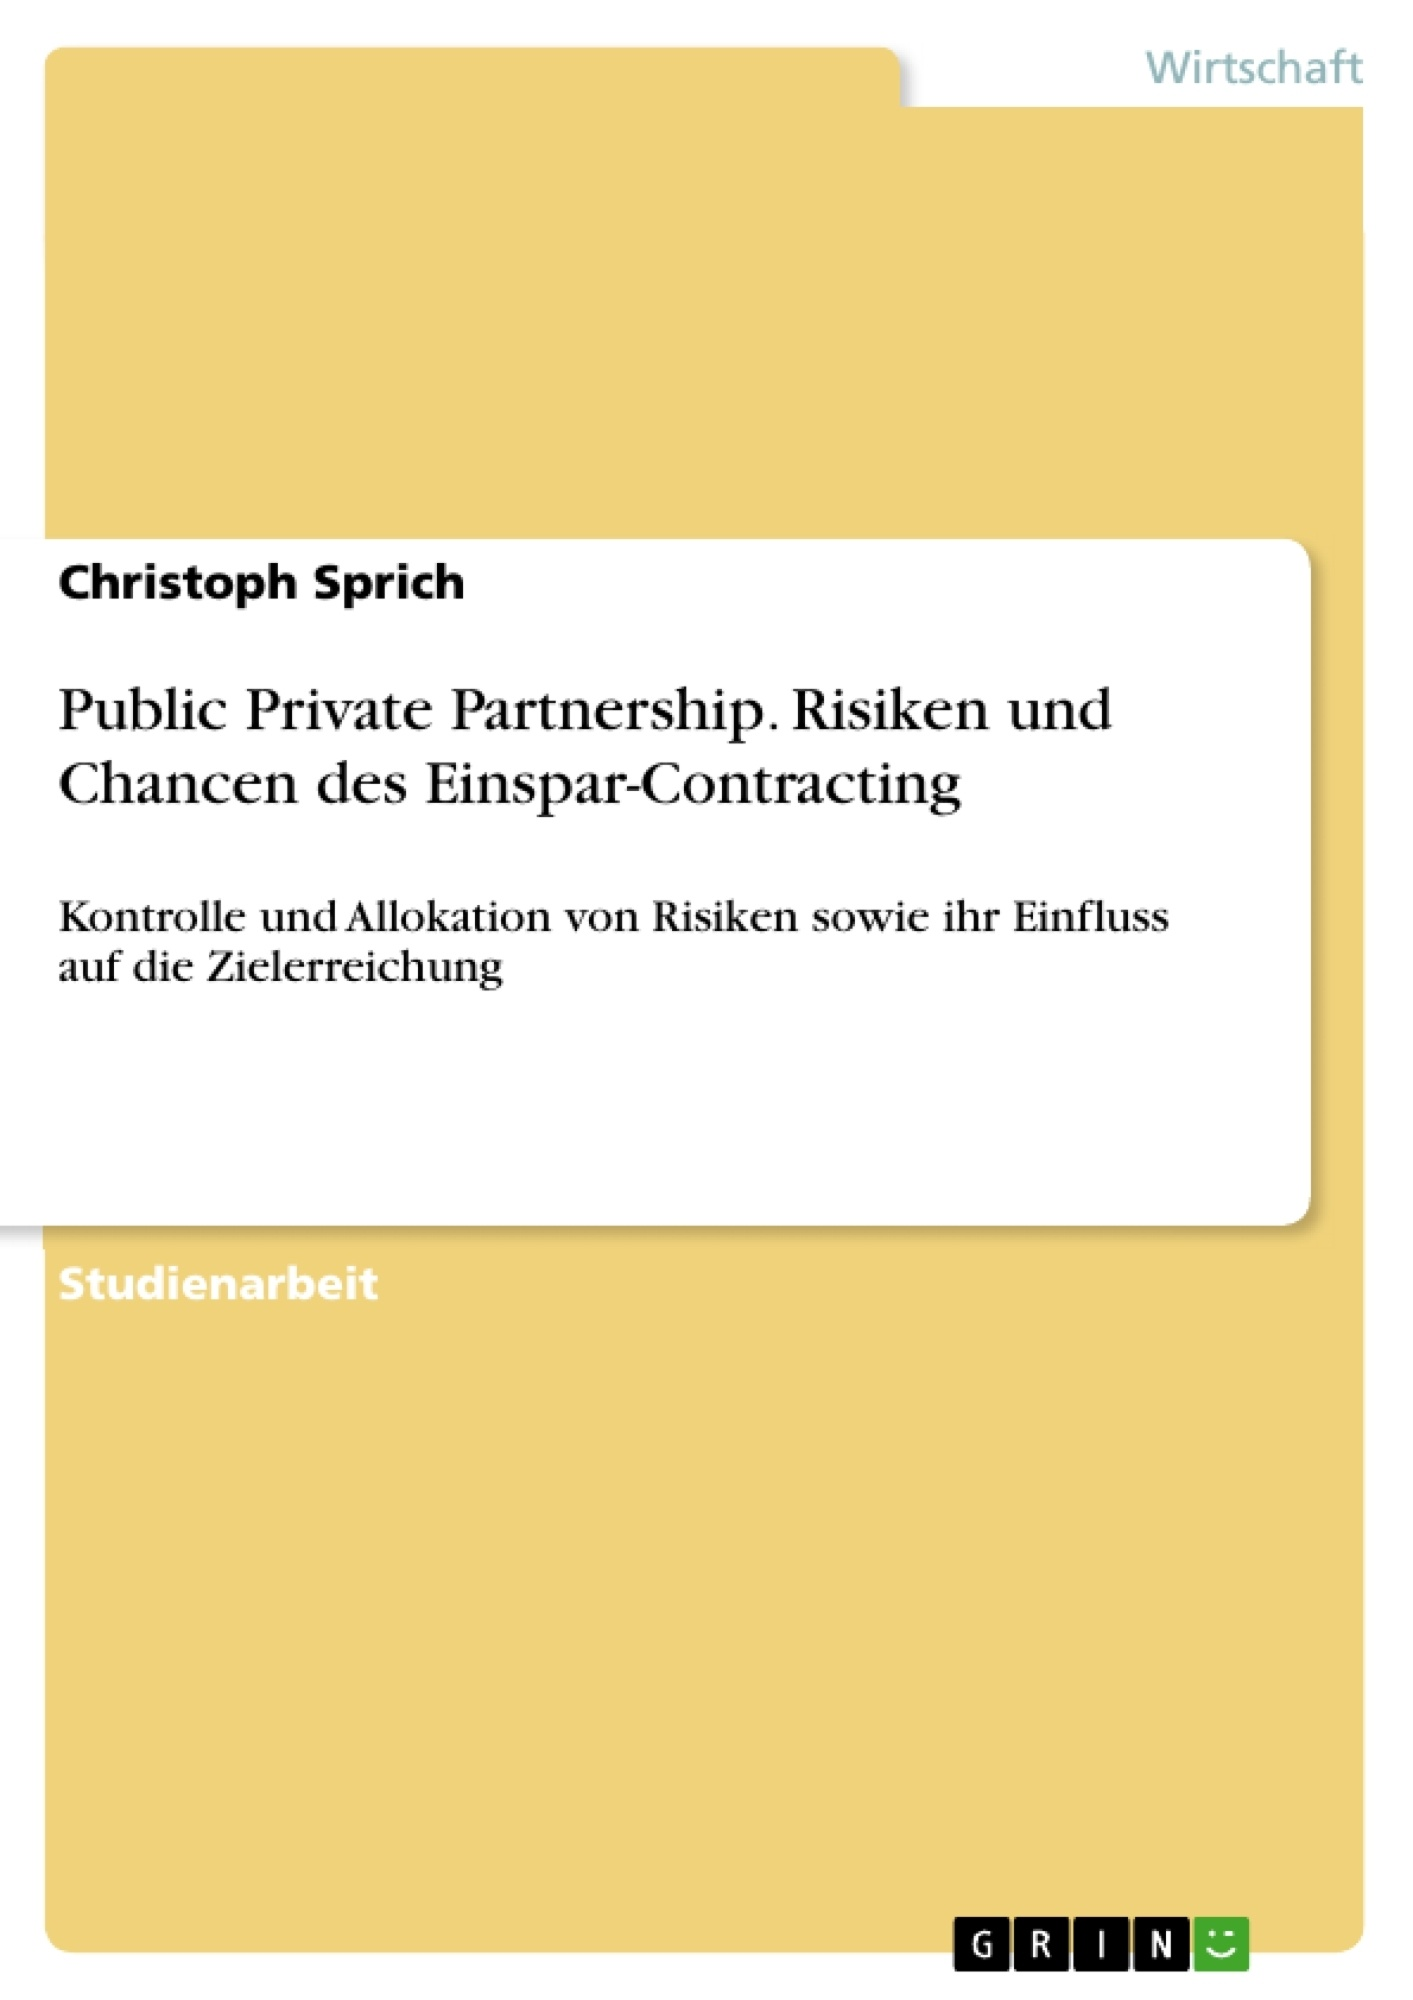 Titel: Public Private Partnership. Risiken und Chancen des Einspar-Contracting